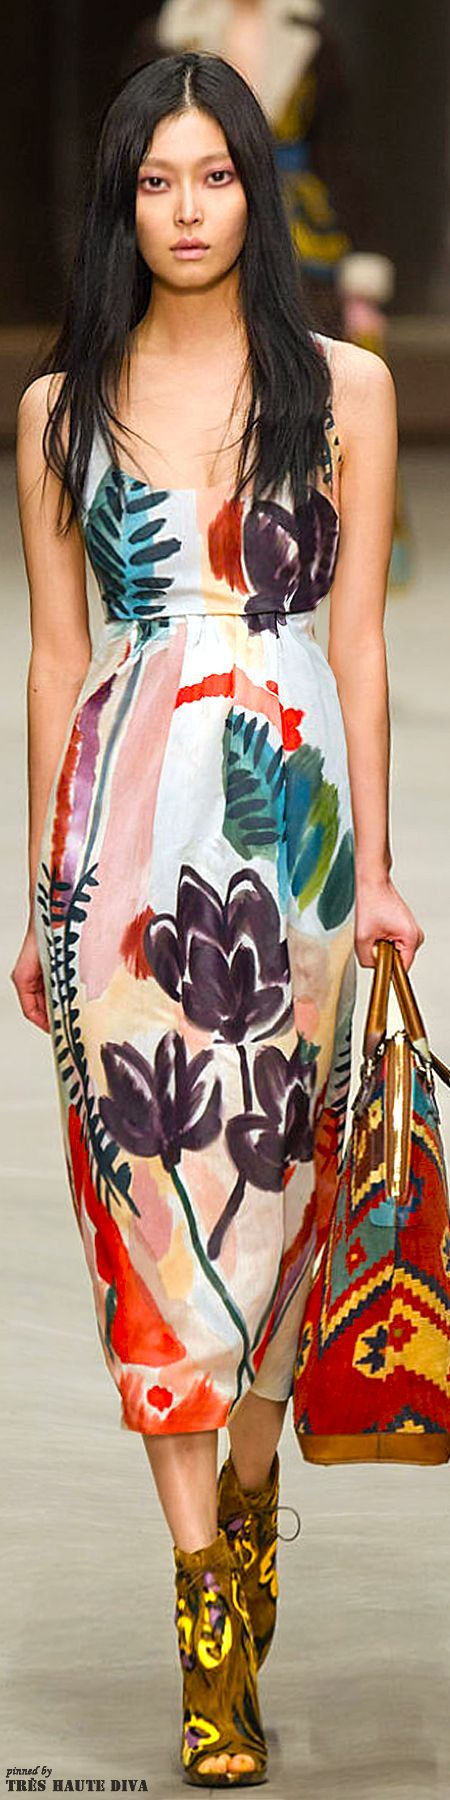 Burberry Prorsum F/W 2014 - London Fashion Week  Looks likes bloomsbury movement